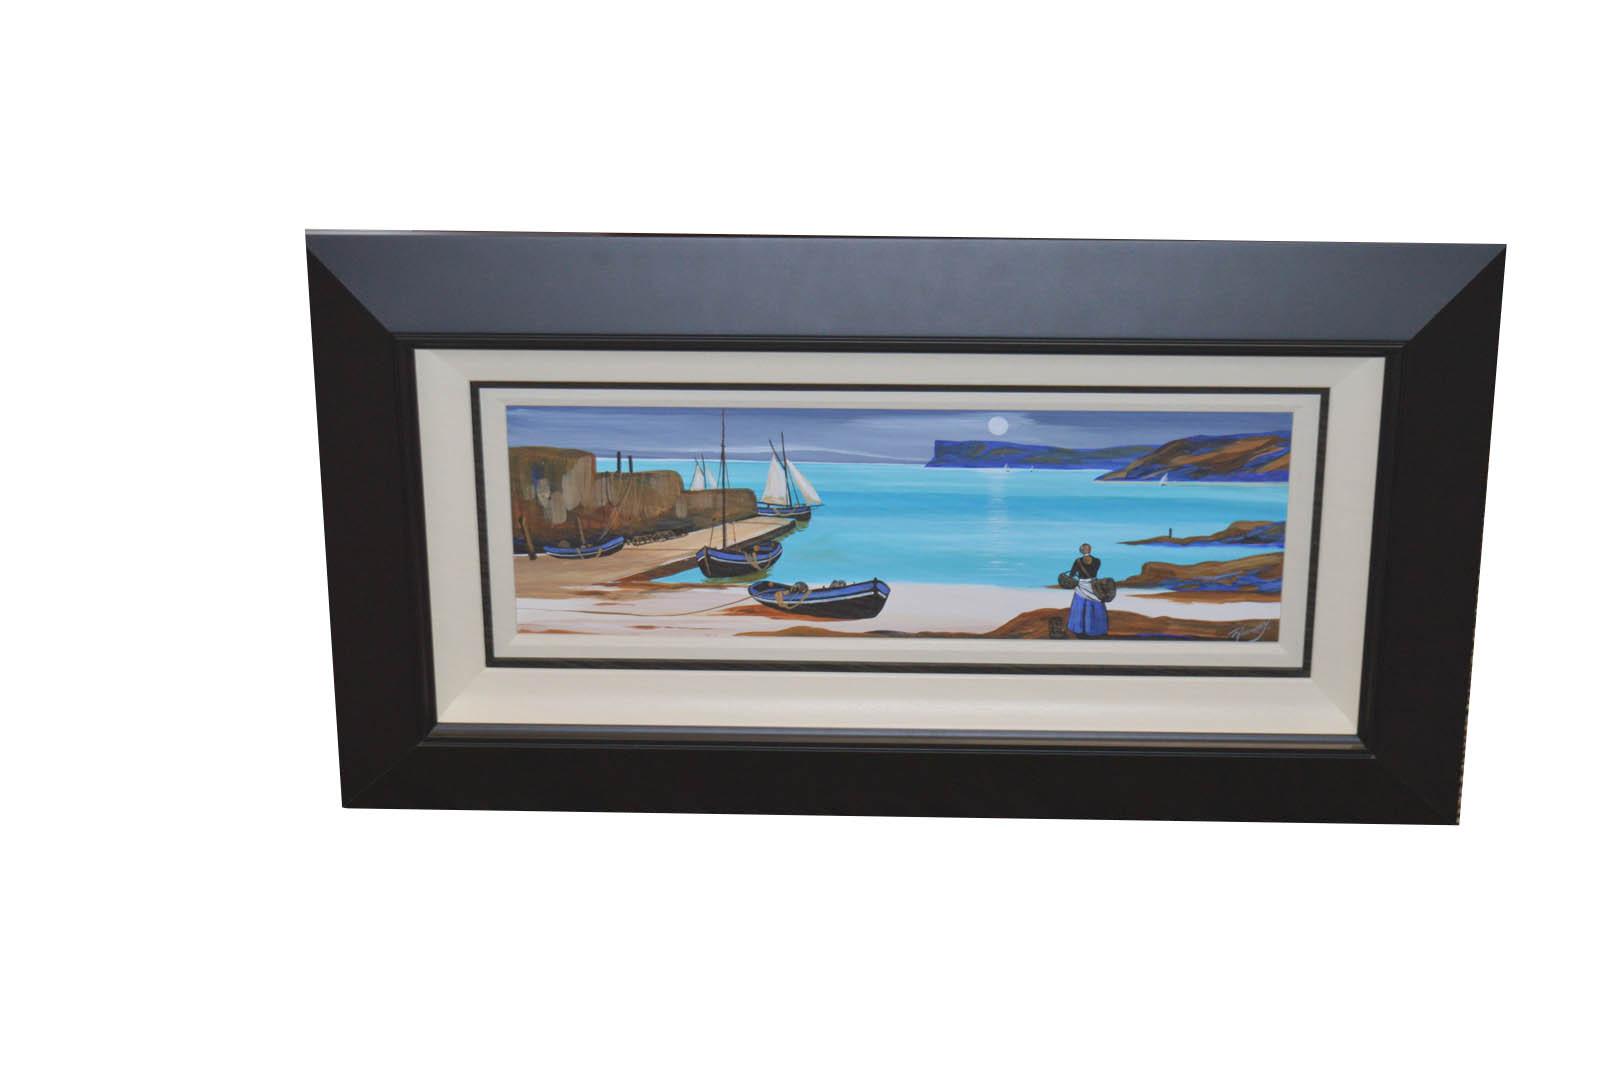 Lot 232 - A Framed Oil Painting 'Moonlit Boatslip, Ballycastle' - J. P Rooney